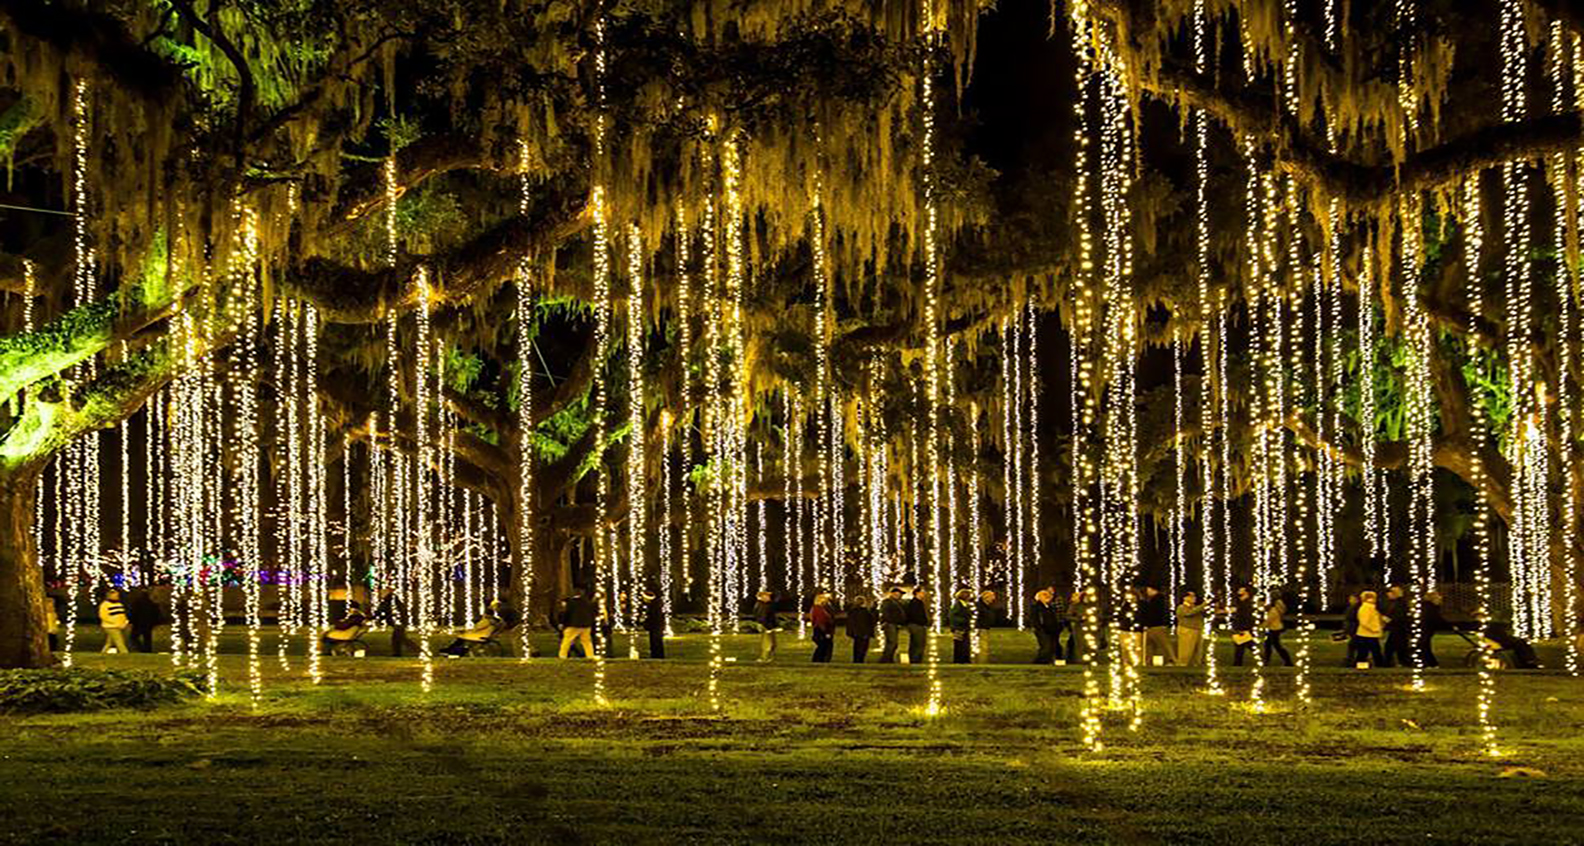 Candles and lights at Brookgreen Gardens